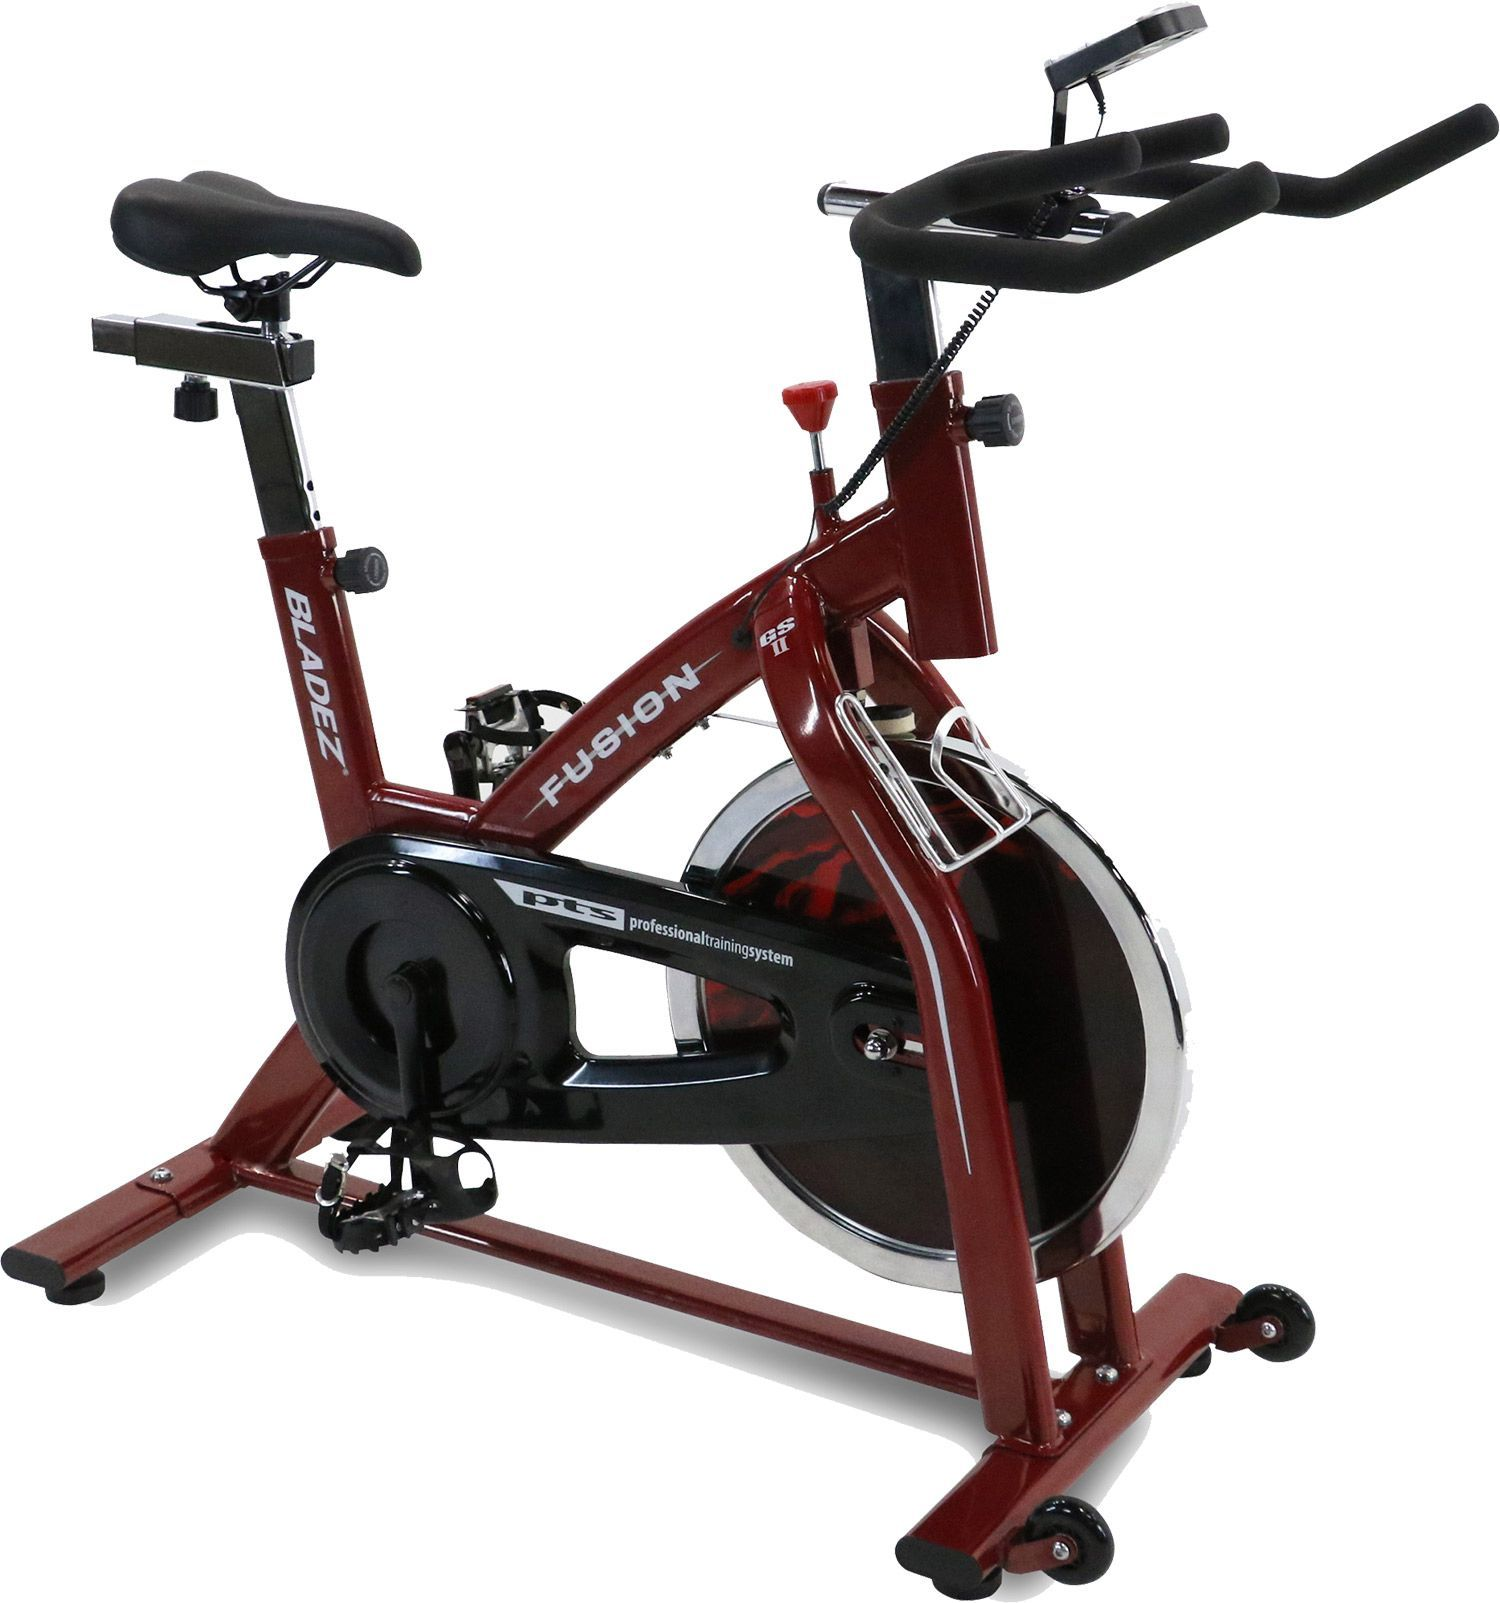 BLADEZ Fitness Fusion GS II Indoor Cycle Indoor cycling